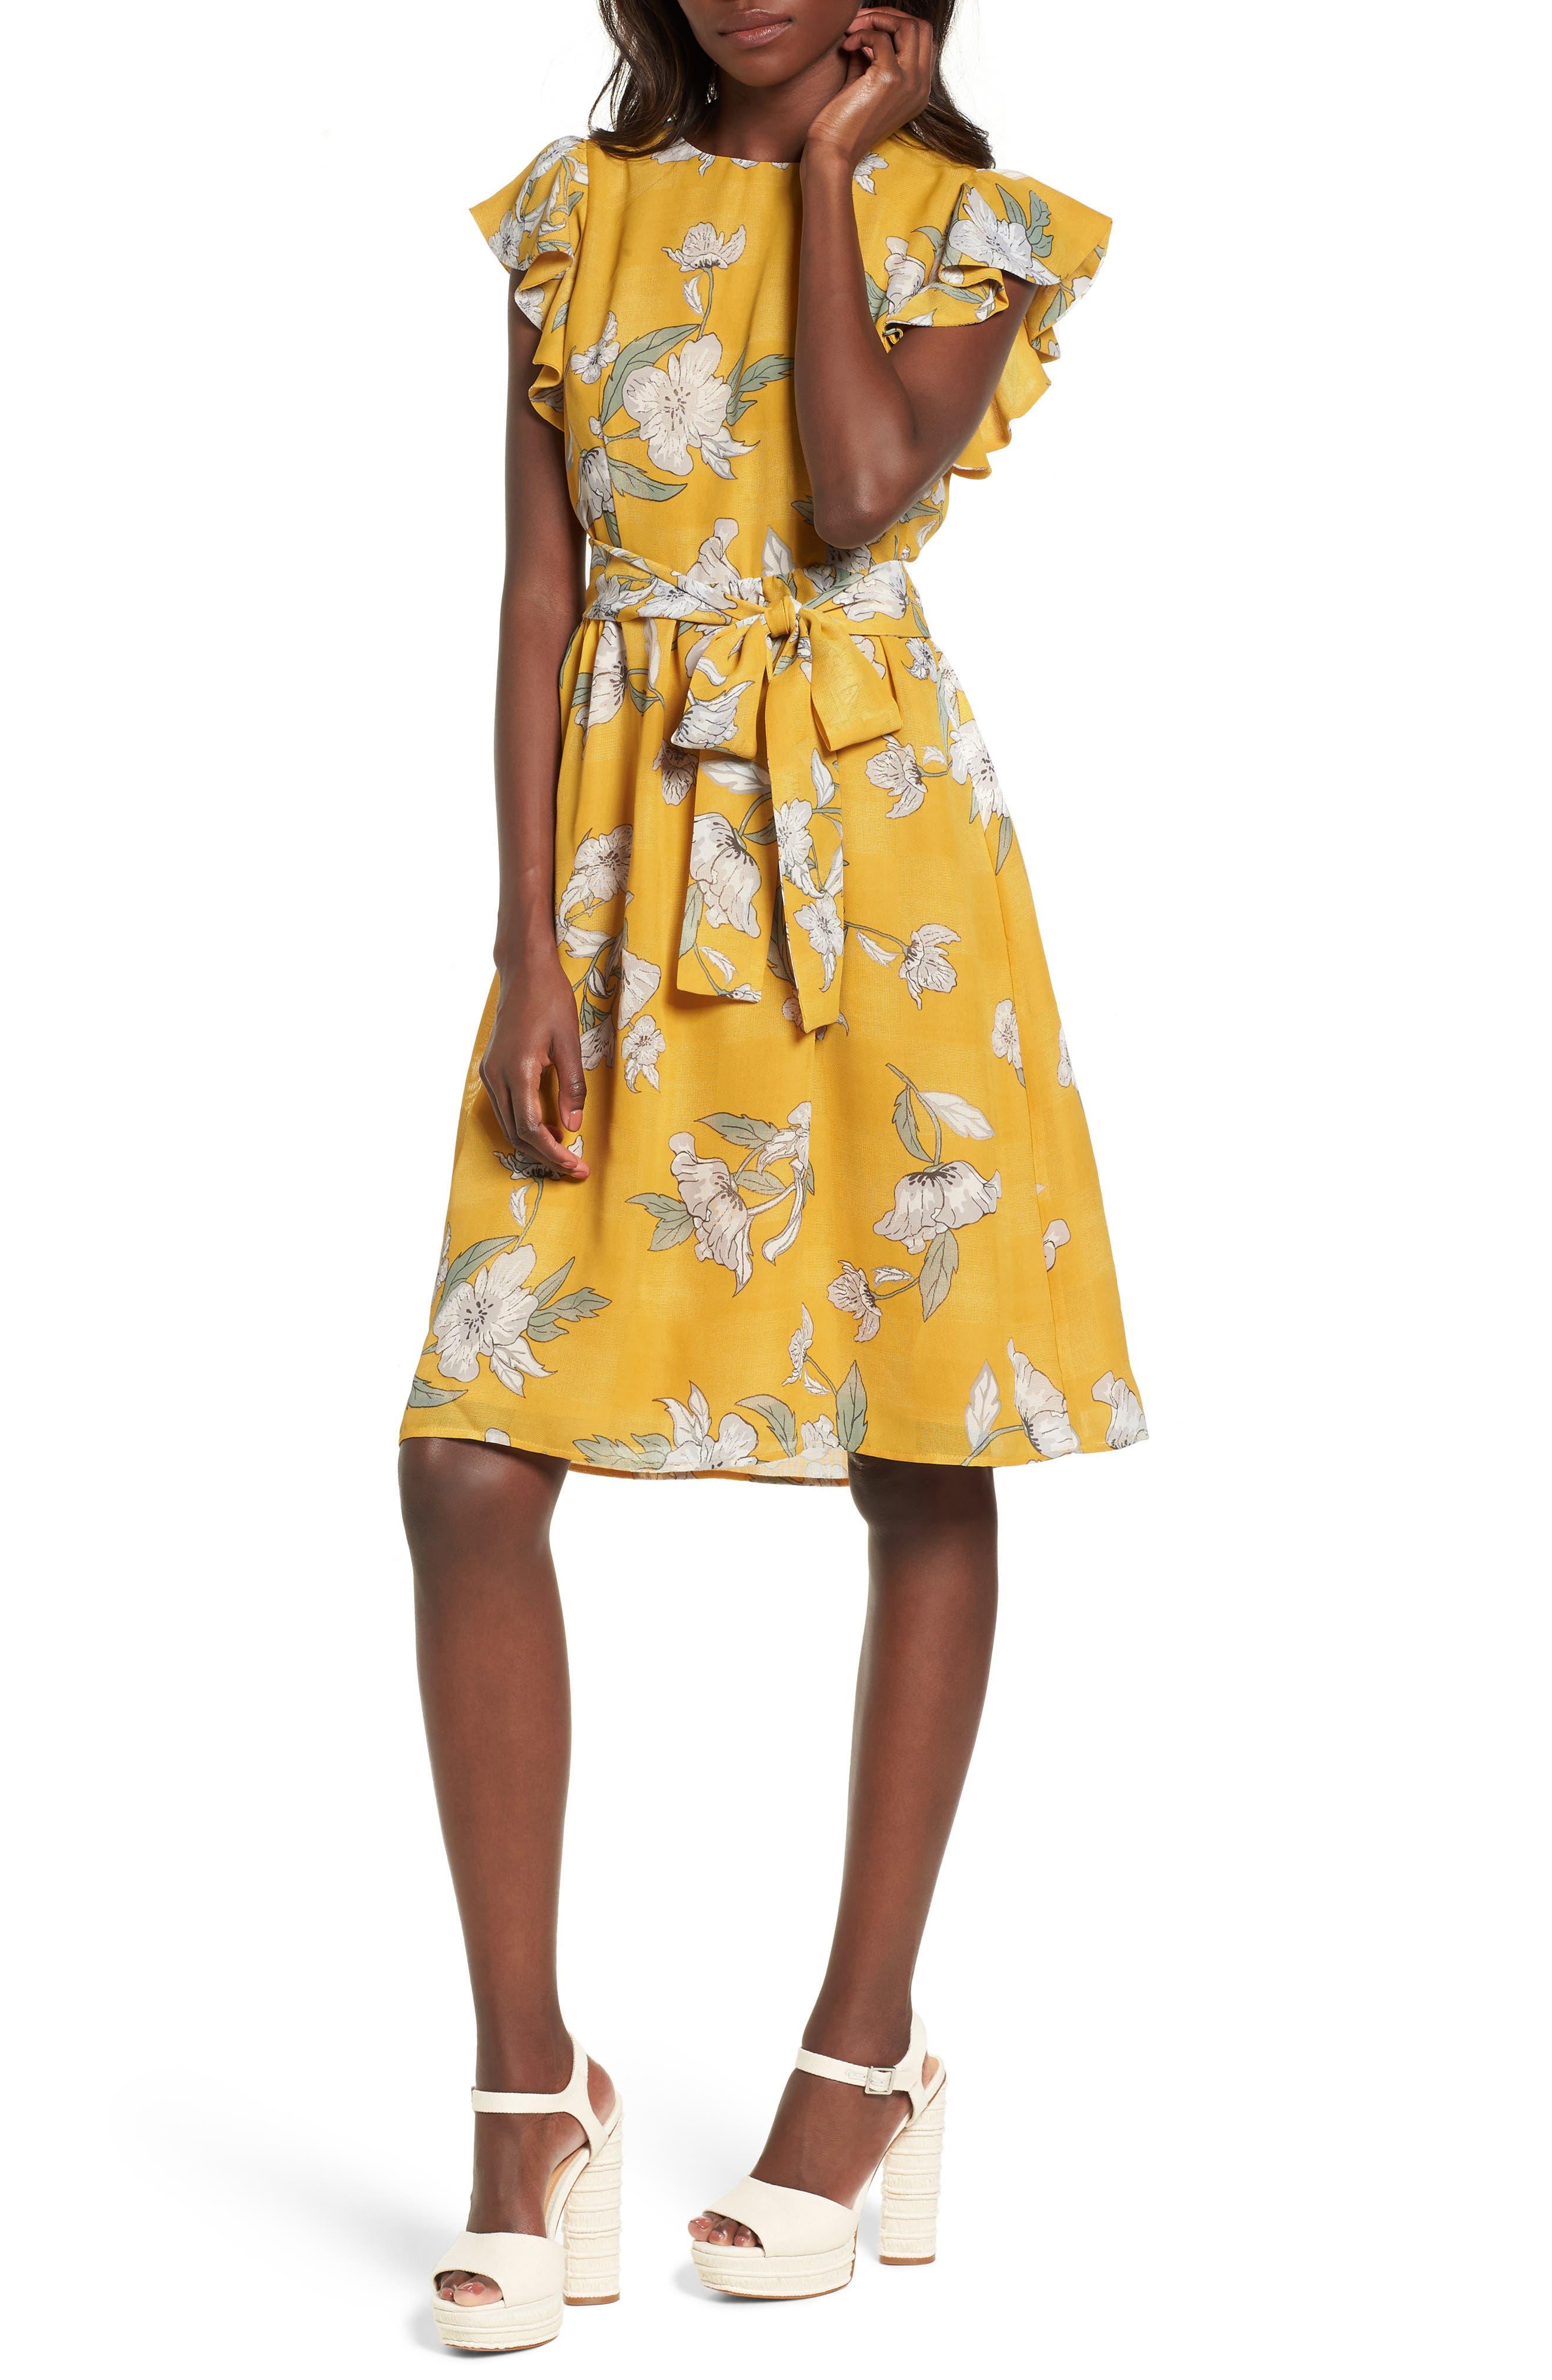 Chriselle x J.O.A. Fit & Flare Dress,                         Main,                         color, 700